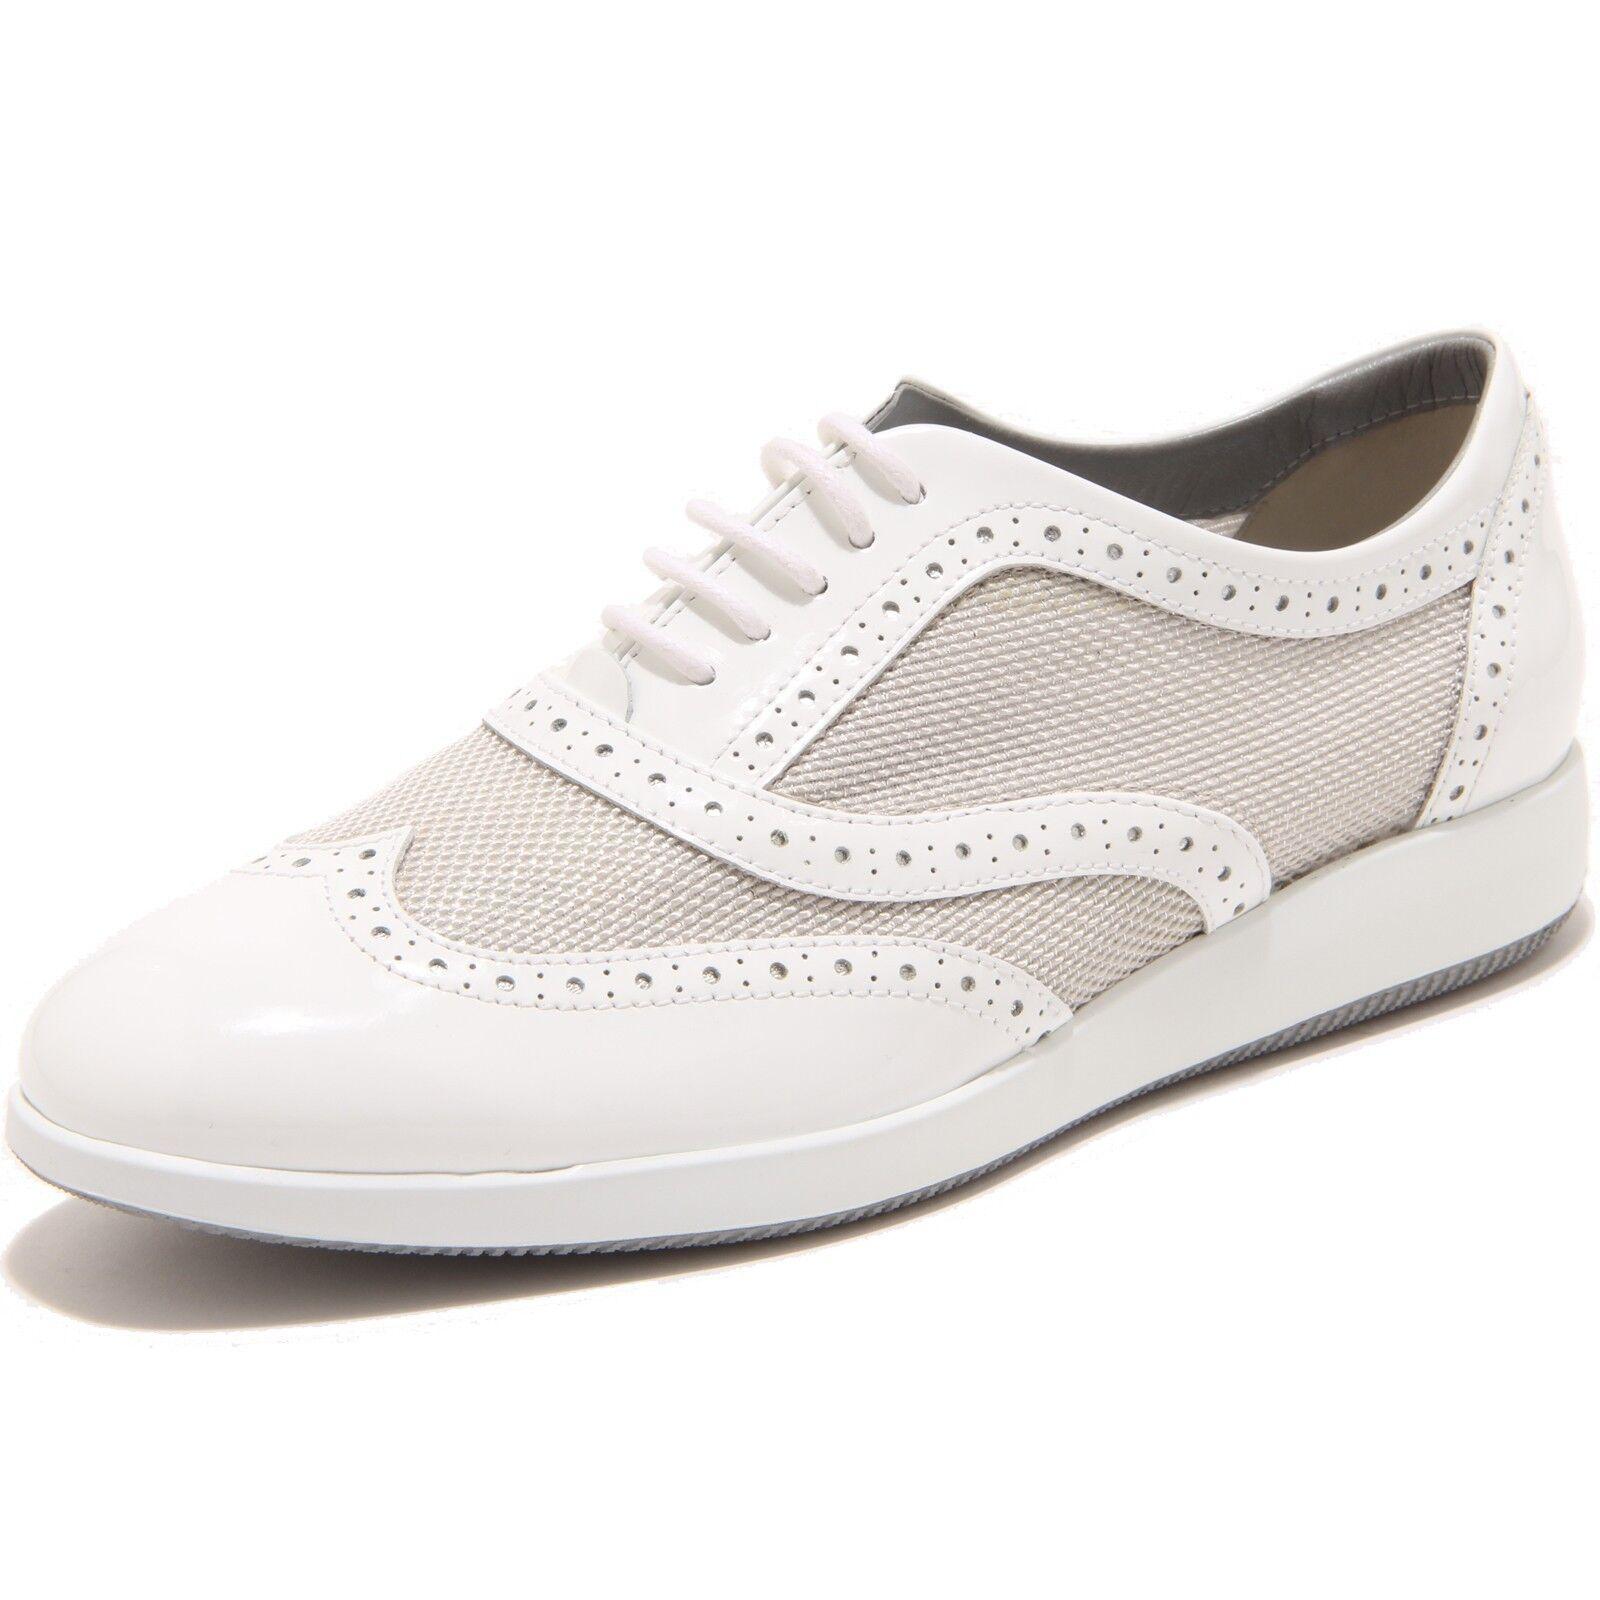 89834 francesina HOGAN H209 DRESS XL BUCATURE scarpa donna Scarpe Donna